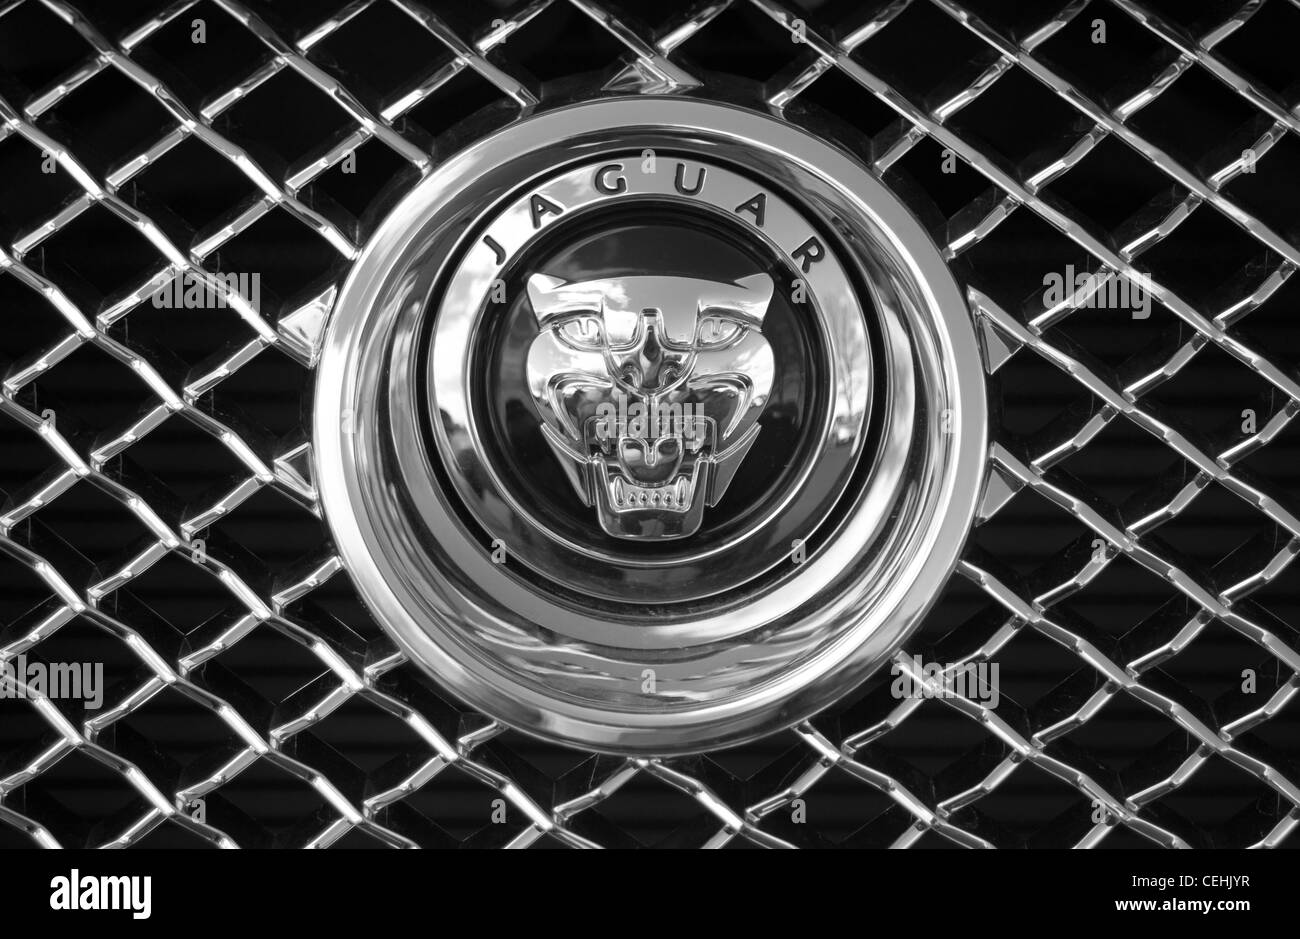 Jaguar Logo On The Car Stainless Steel Radiator Stock Photo